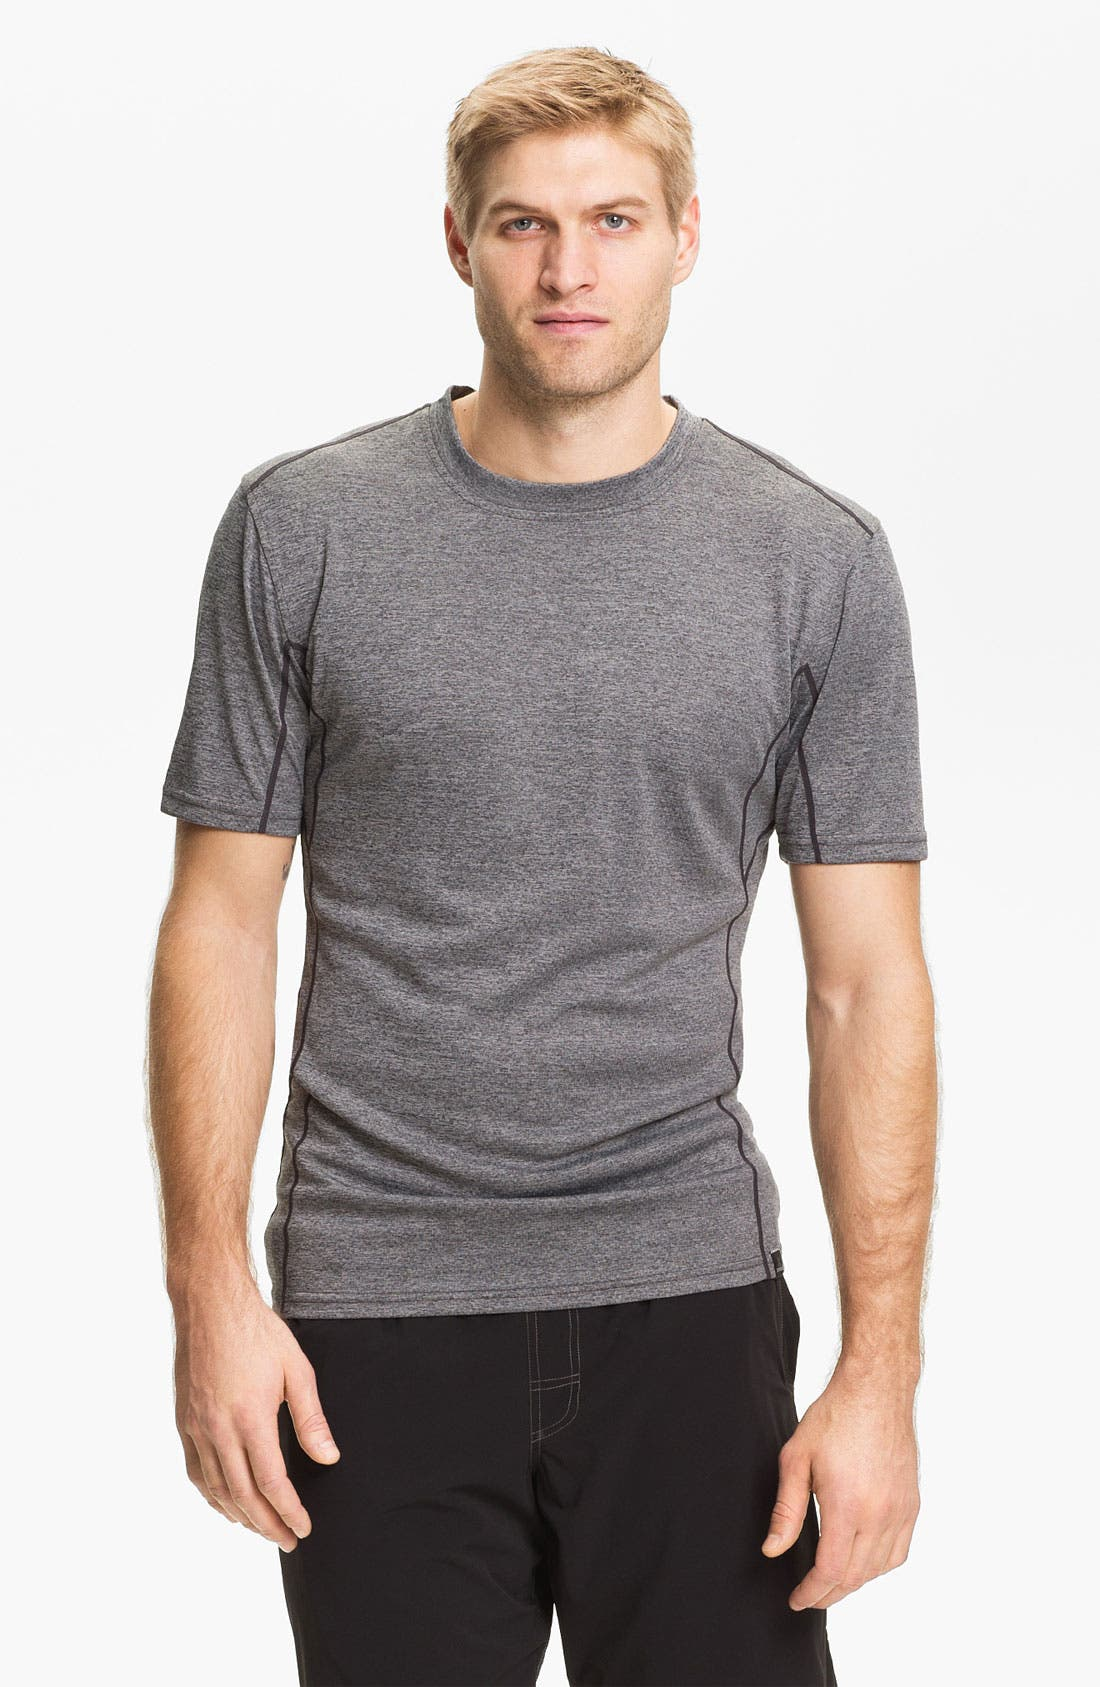 Alternate Image 1 Selected - prAna 'Talon' Crewneck T-Shirt